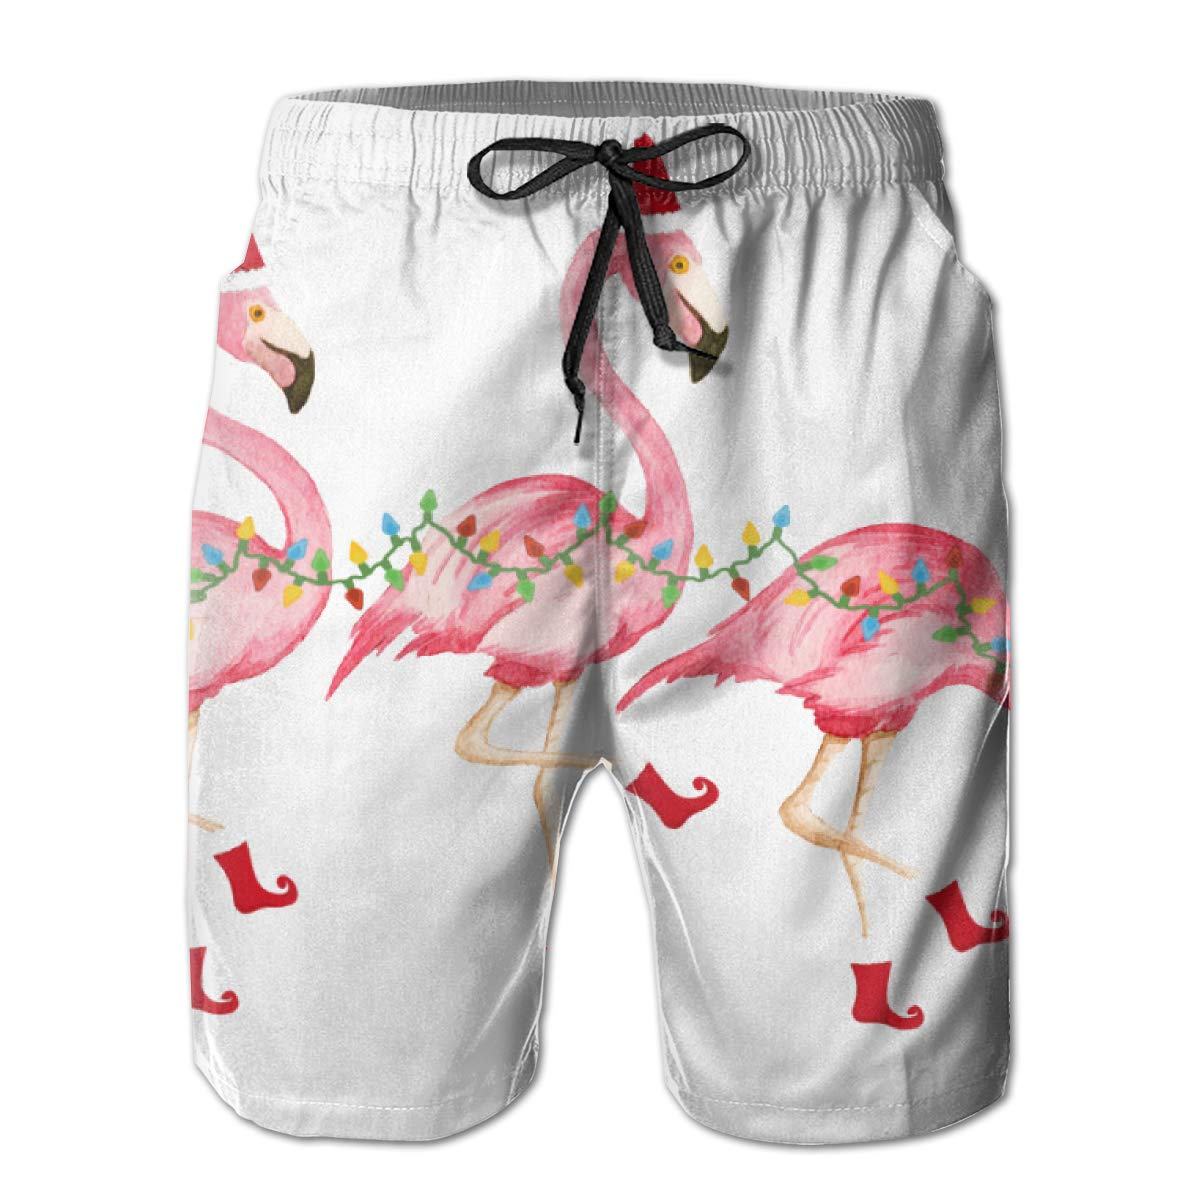 Comfortable Board Shorts with Pockets Mens 100/% Polyester Three Flamingos Beachwear